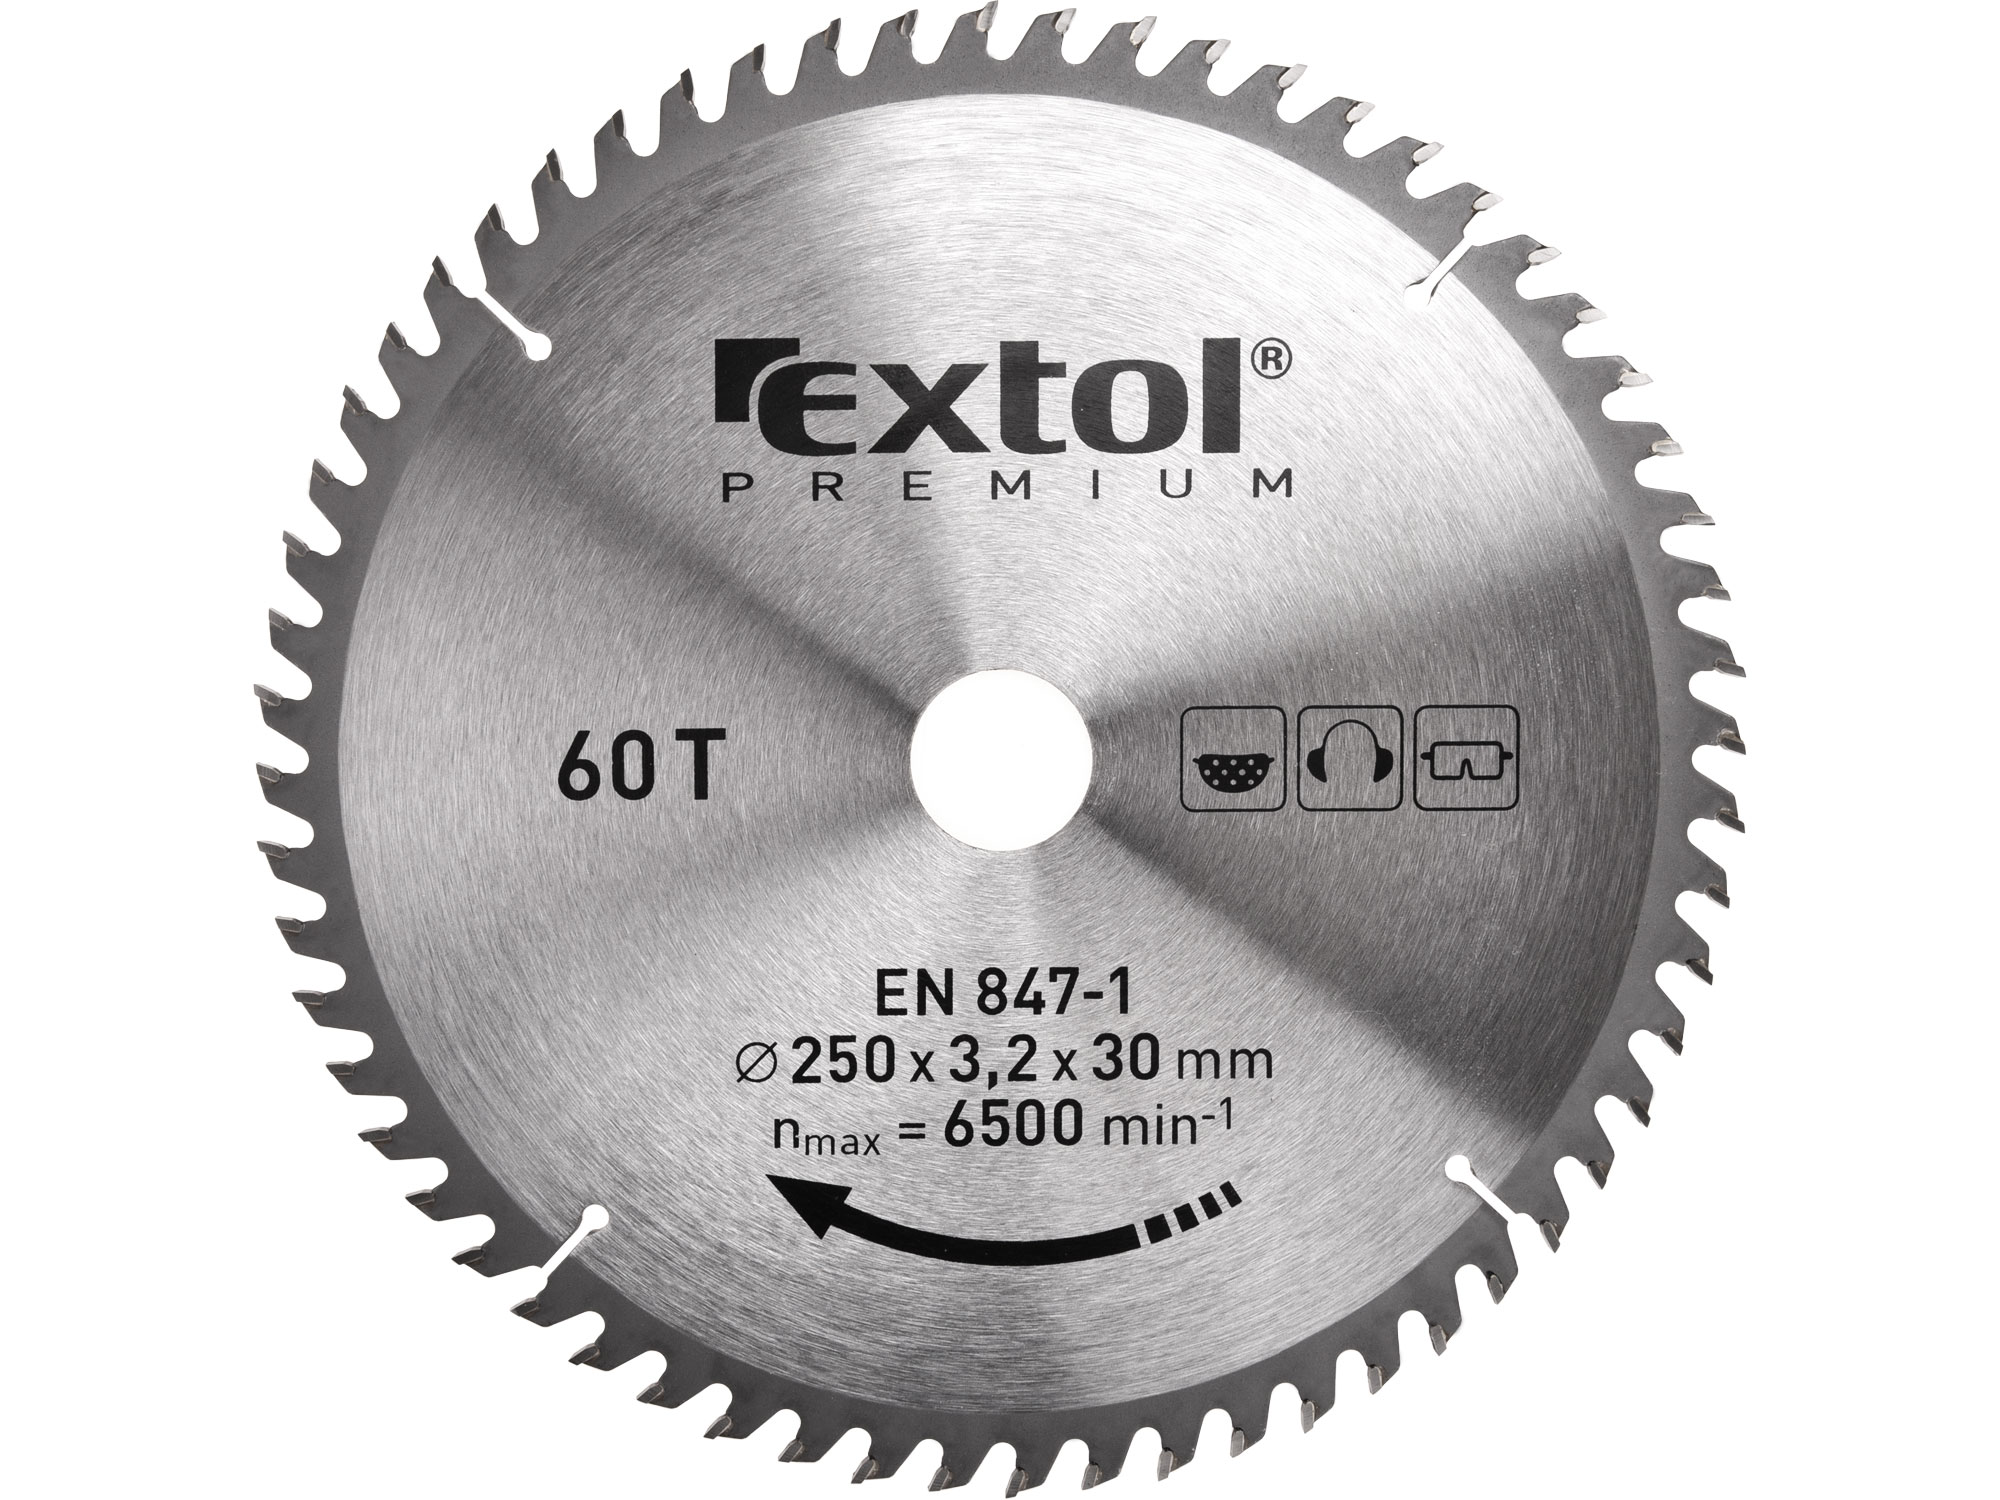 250mm TCT Circular Saw Blade, 250mm Dia. 30mm ID, 60t